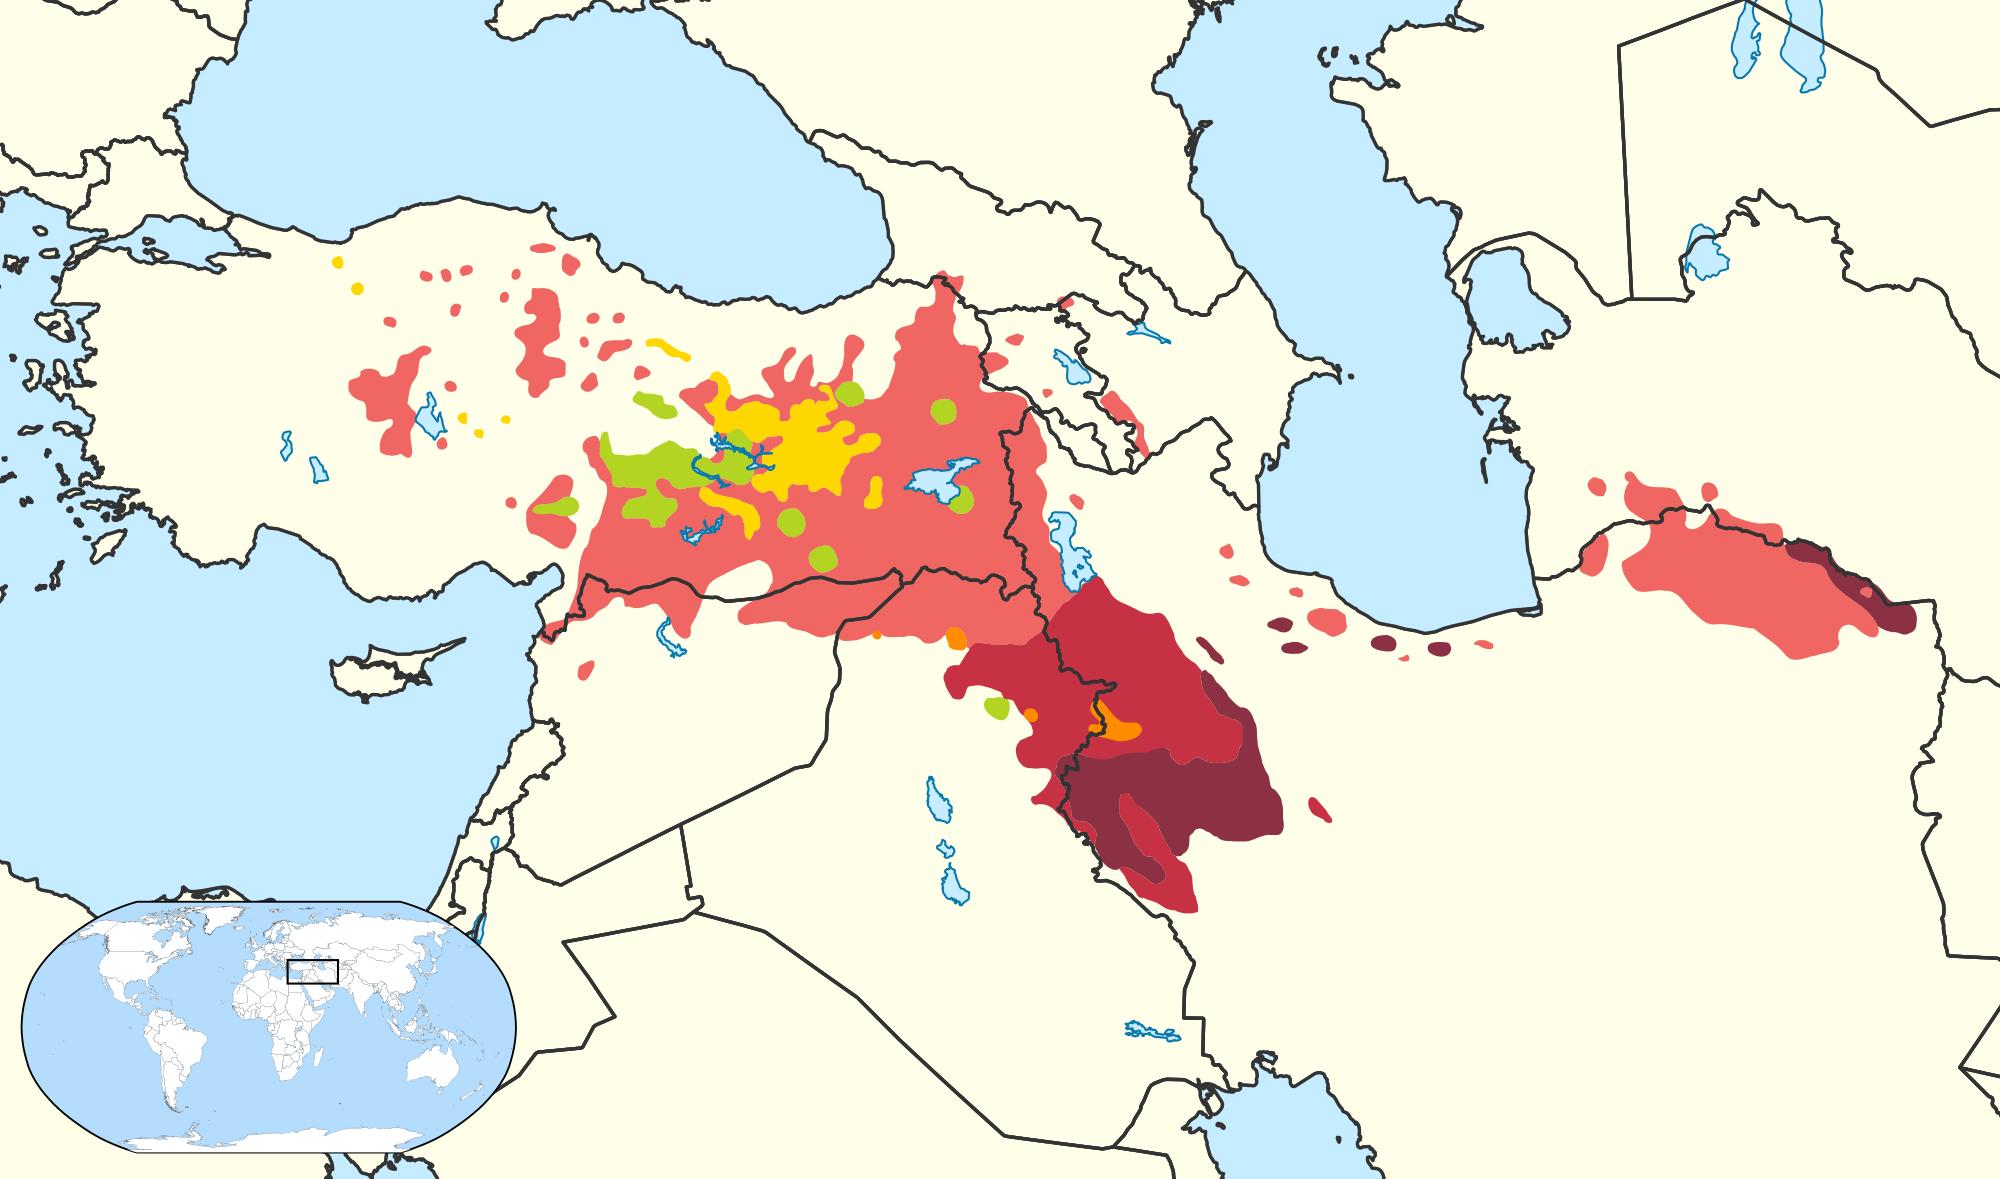 kurdish_languages_map_svg.png